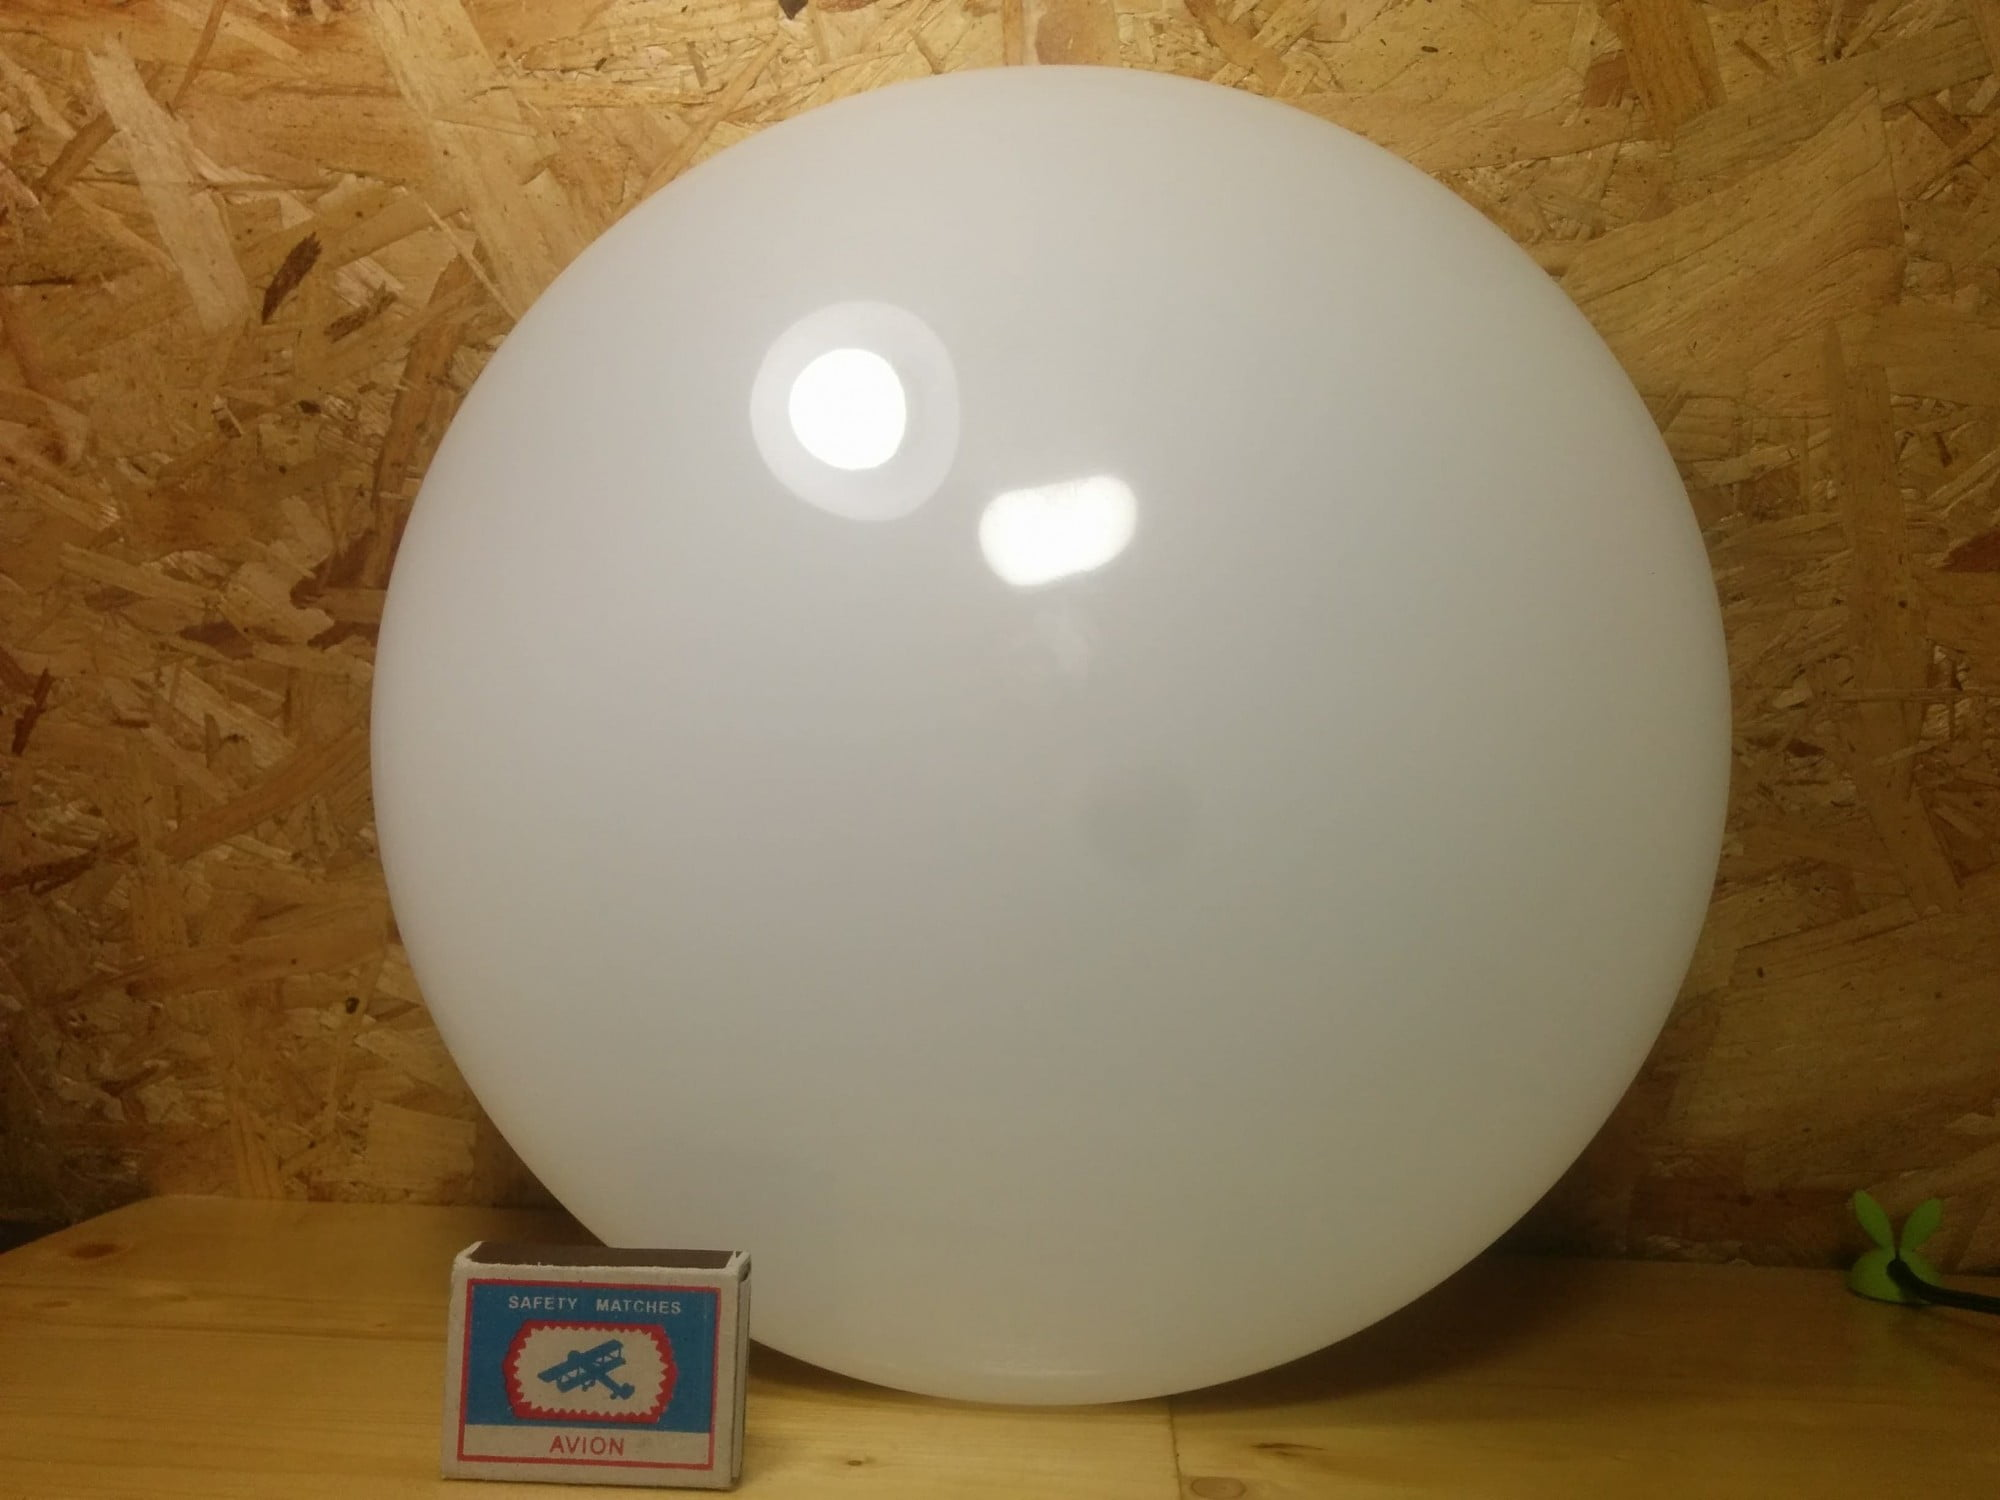 Brawex S51201-DSL4S-25L арт. S51201-DSL4S-25L Лампа